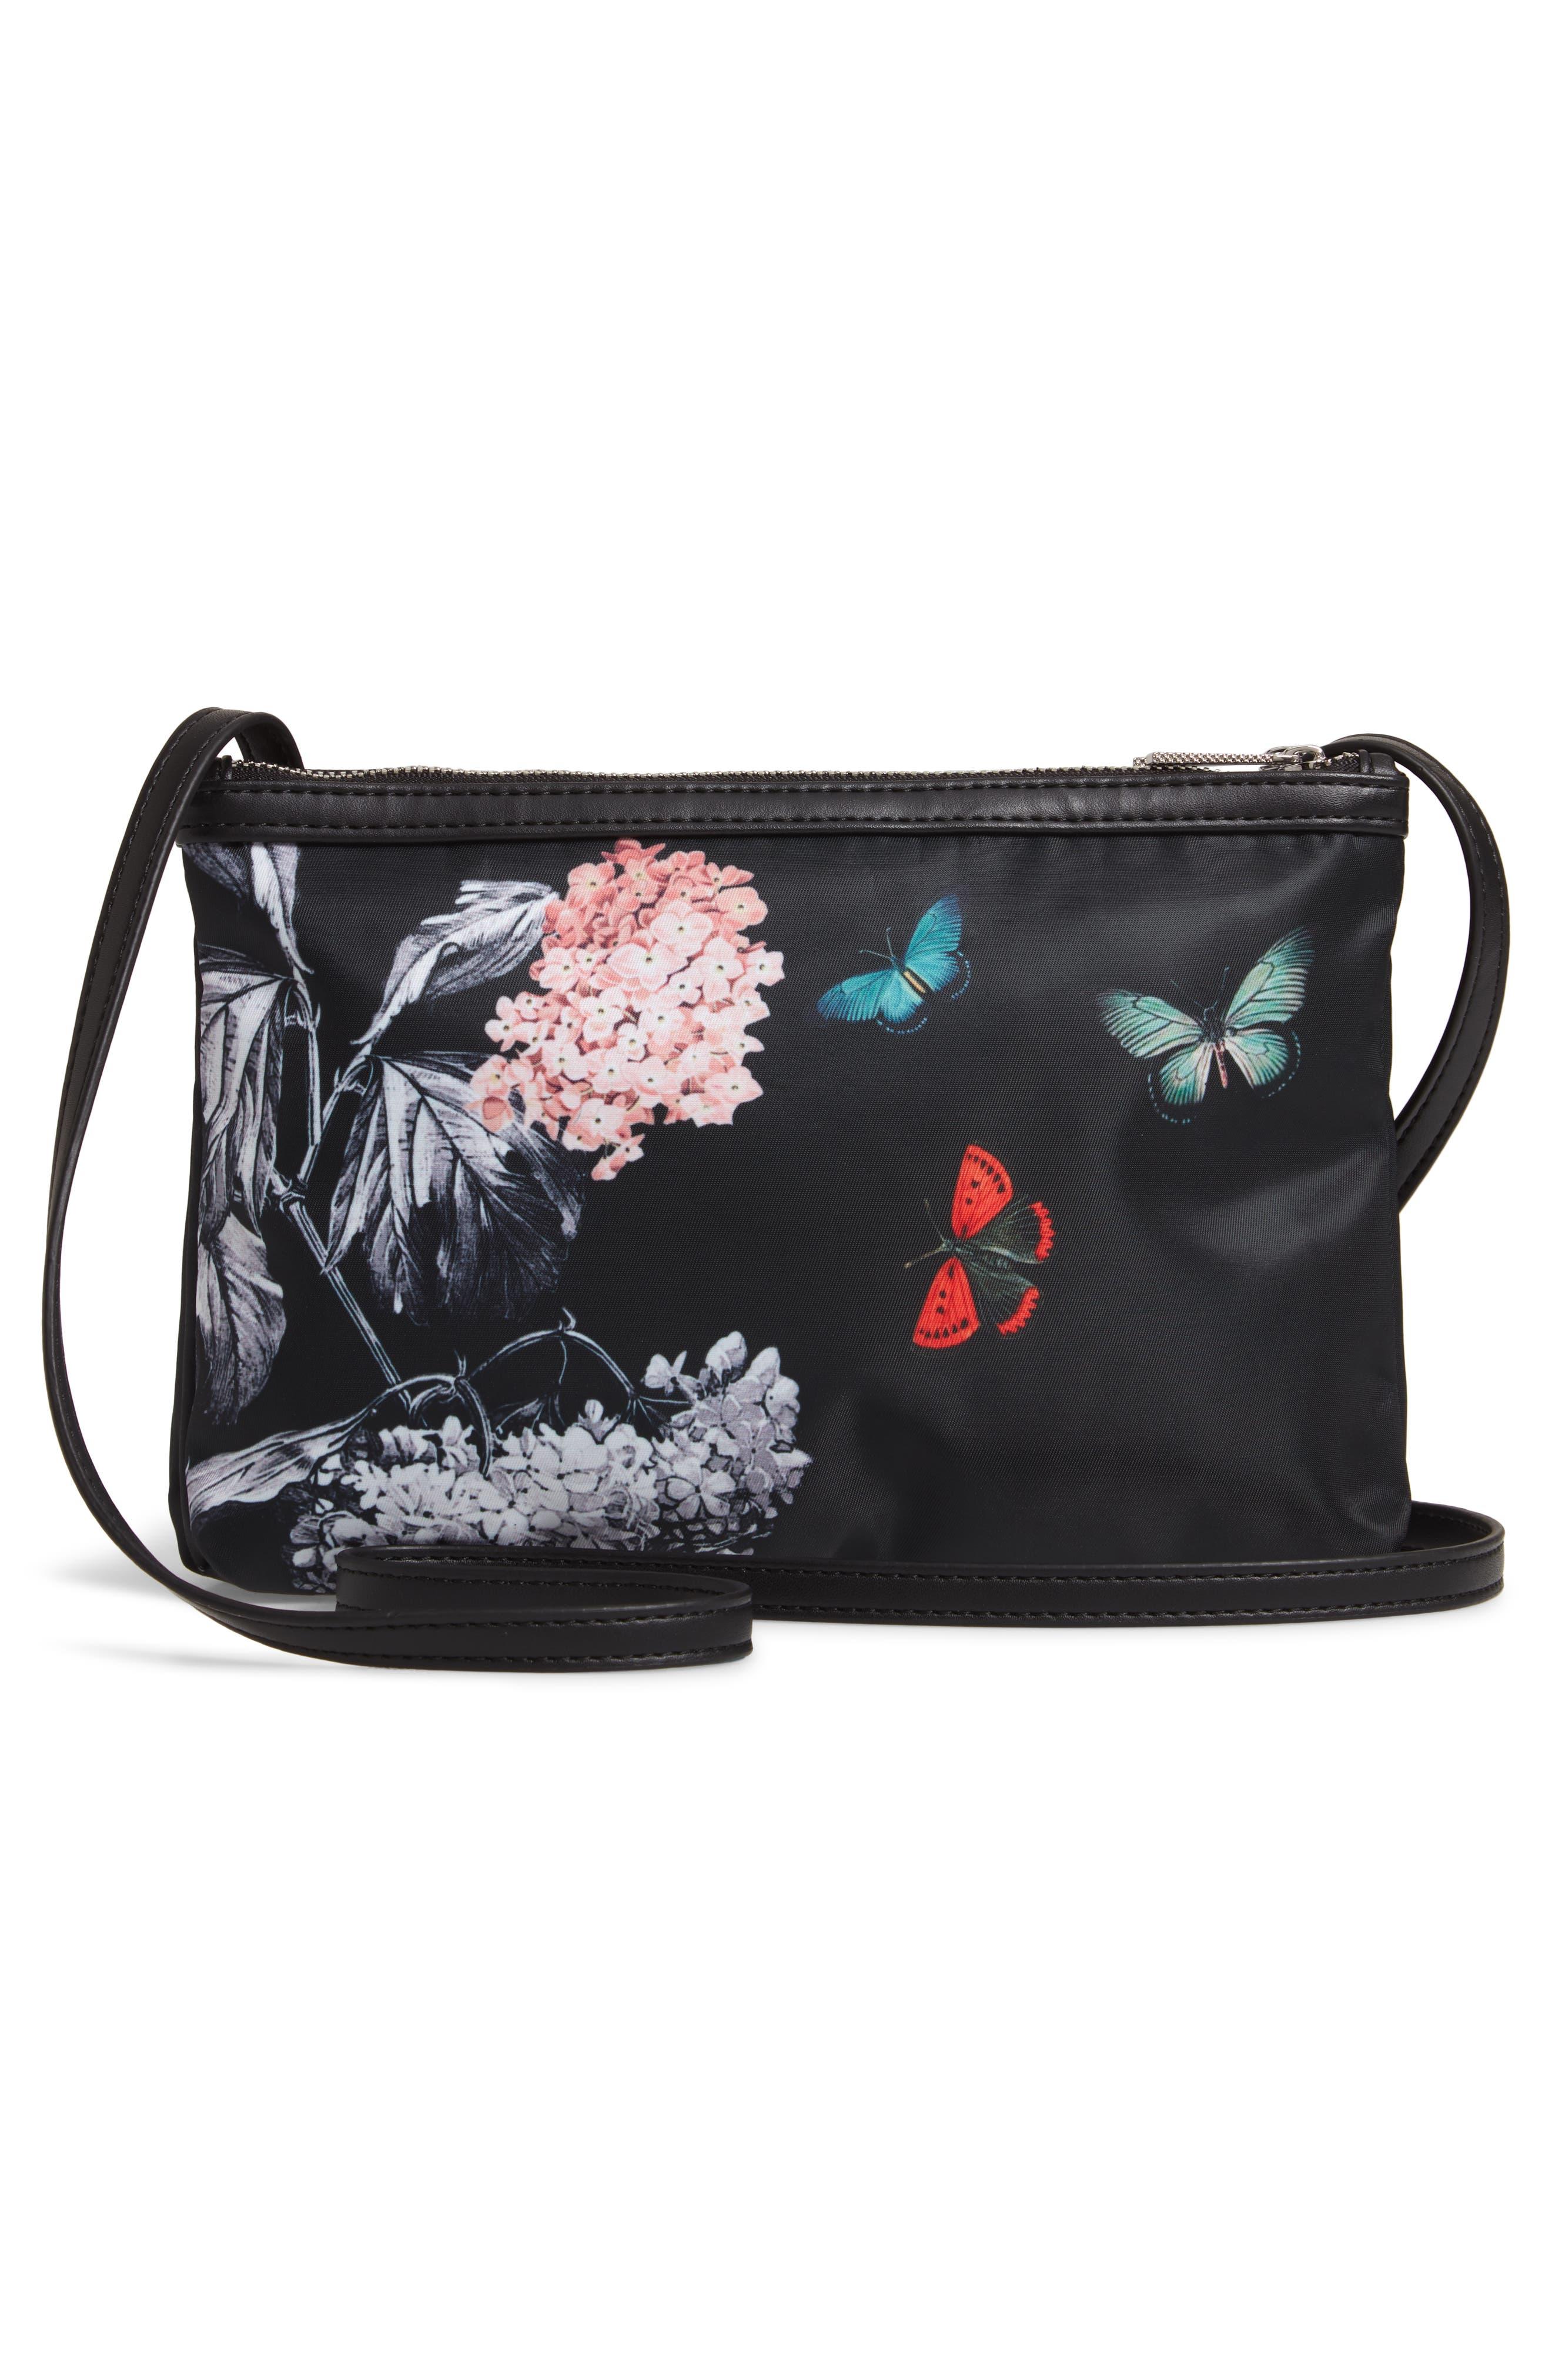 Myyaa Narrnia Nylon Crossbody Bag,                             Alternate thumbnail 3, color,                             BLACK